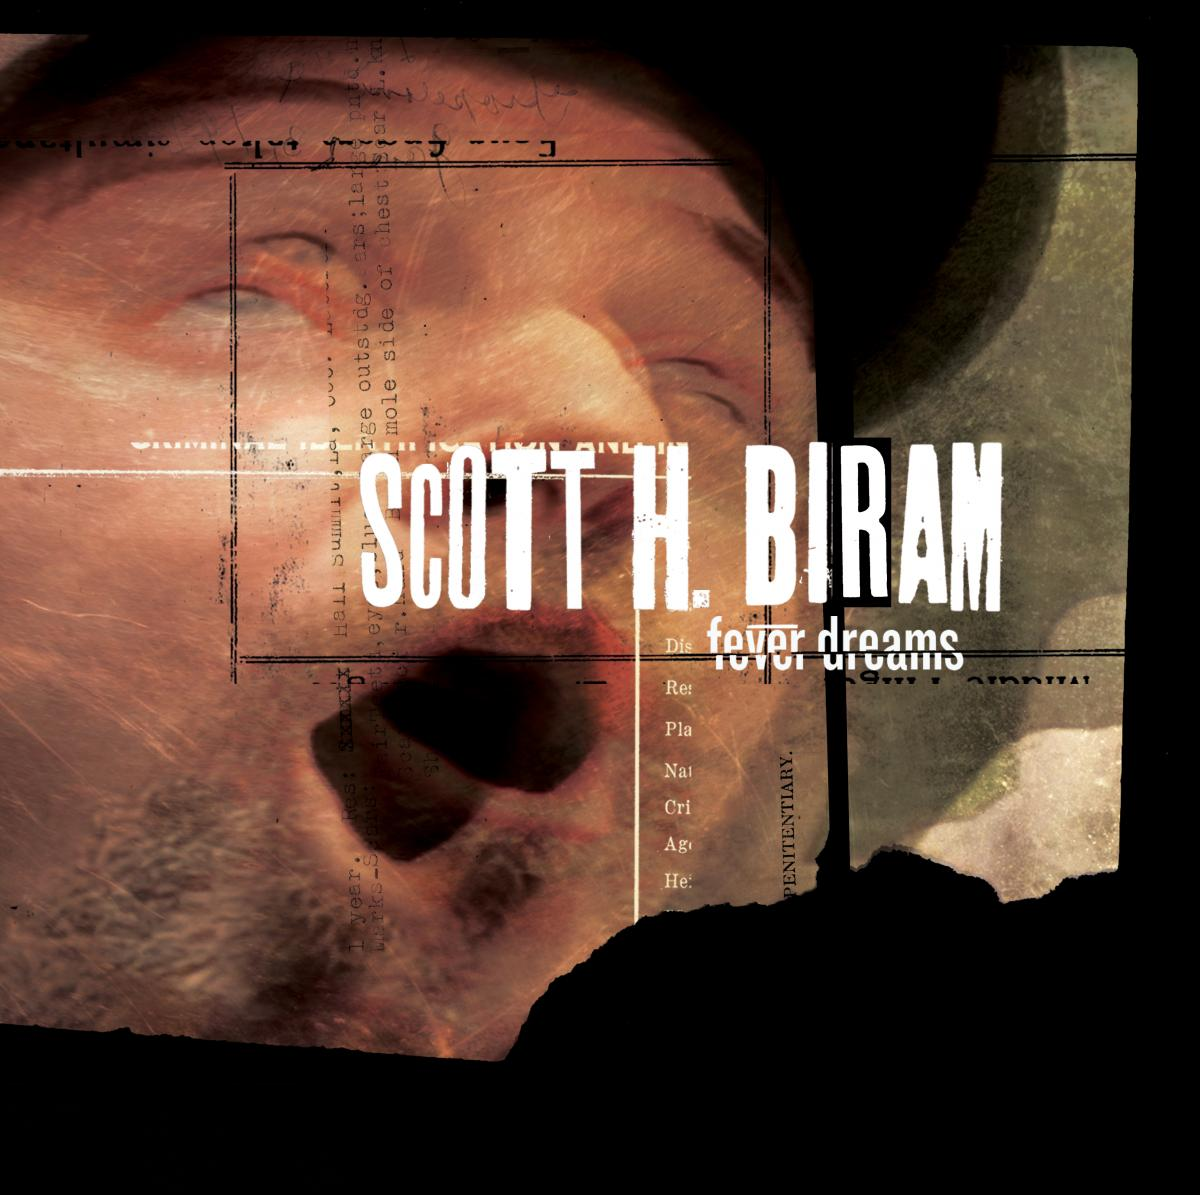 Scott H. Biram – Fever Dreams (cover art)